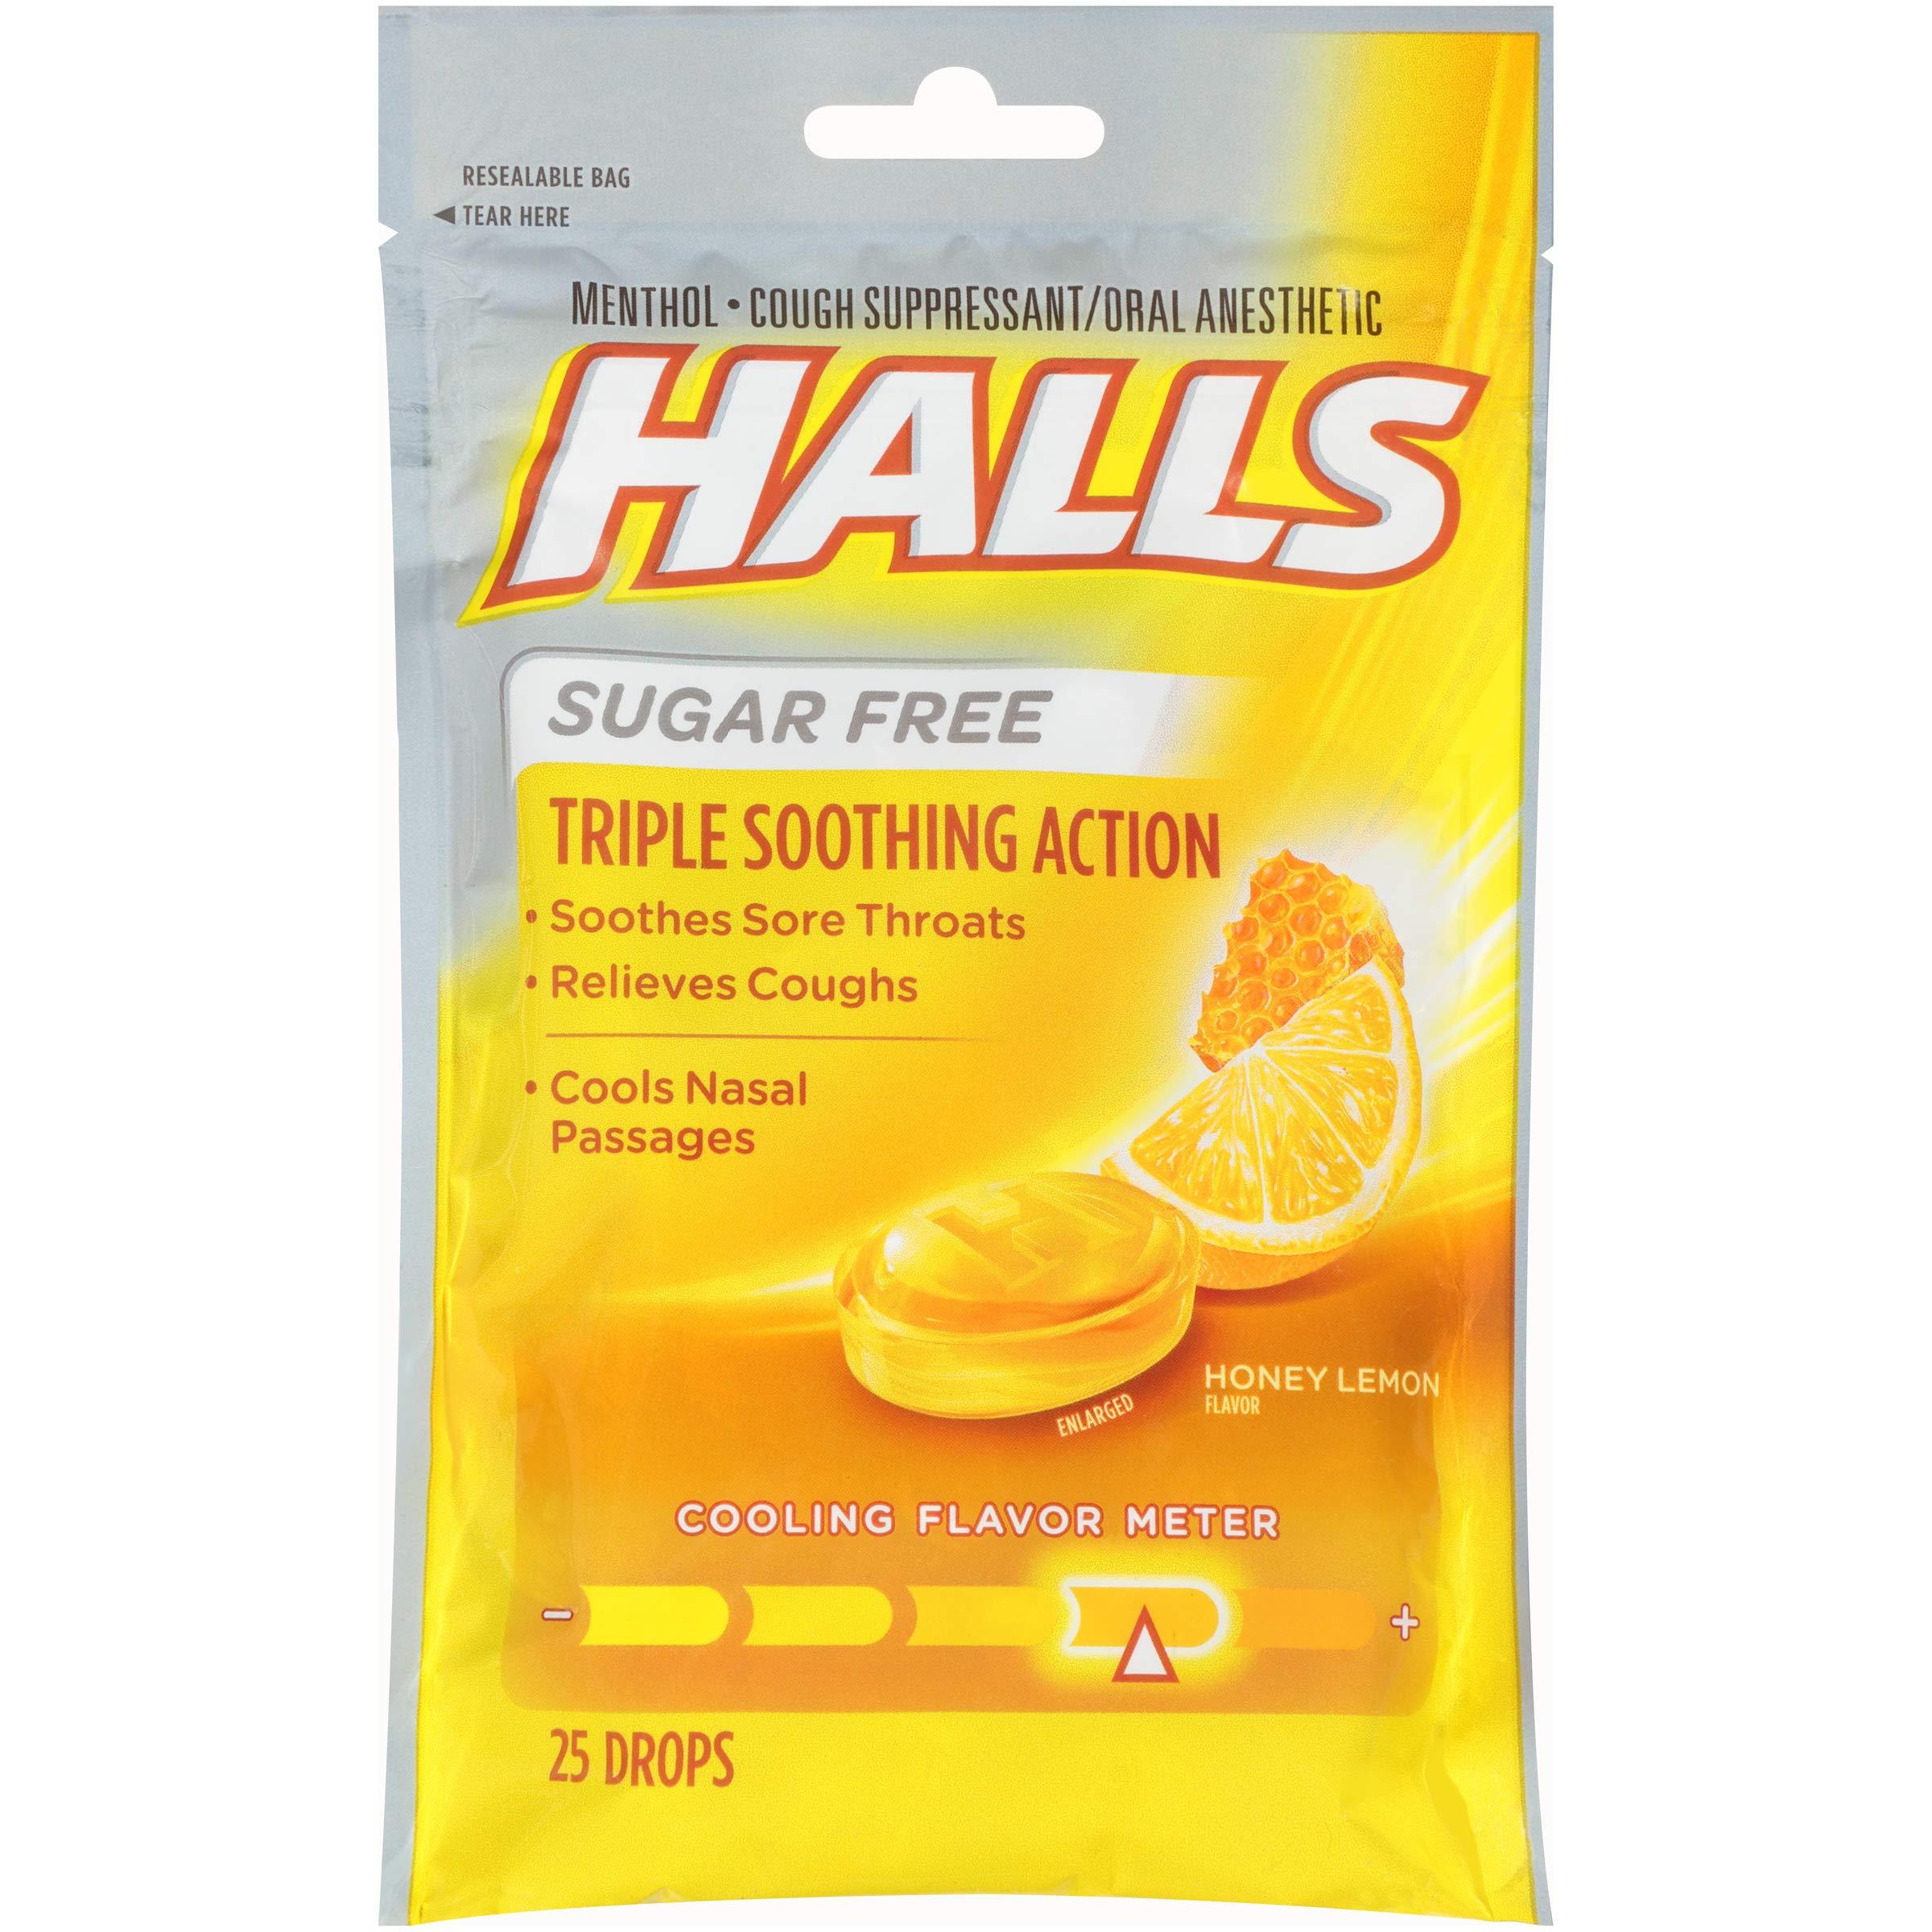 HALLS Sugar Free Cough Drops Honey Lemon & Black Cherry Variety Pack - 150 total drops by Halls (Image #3)